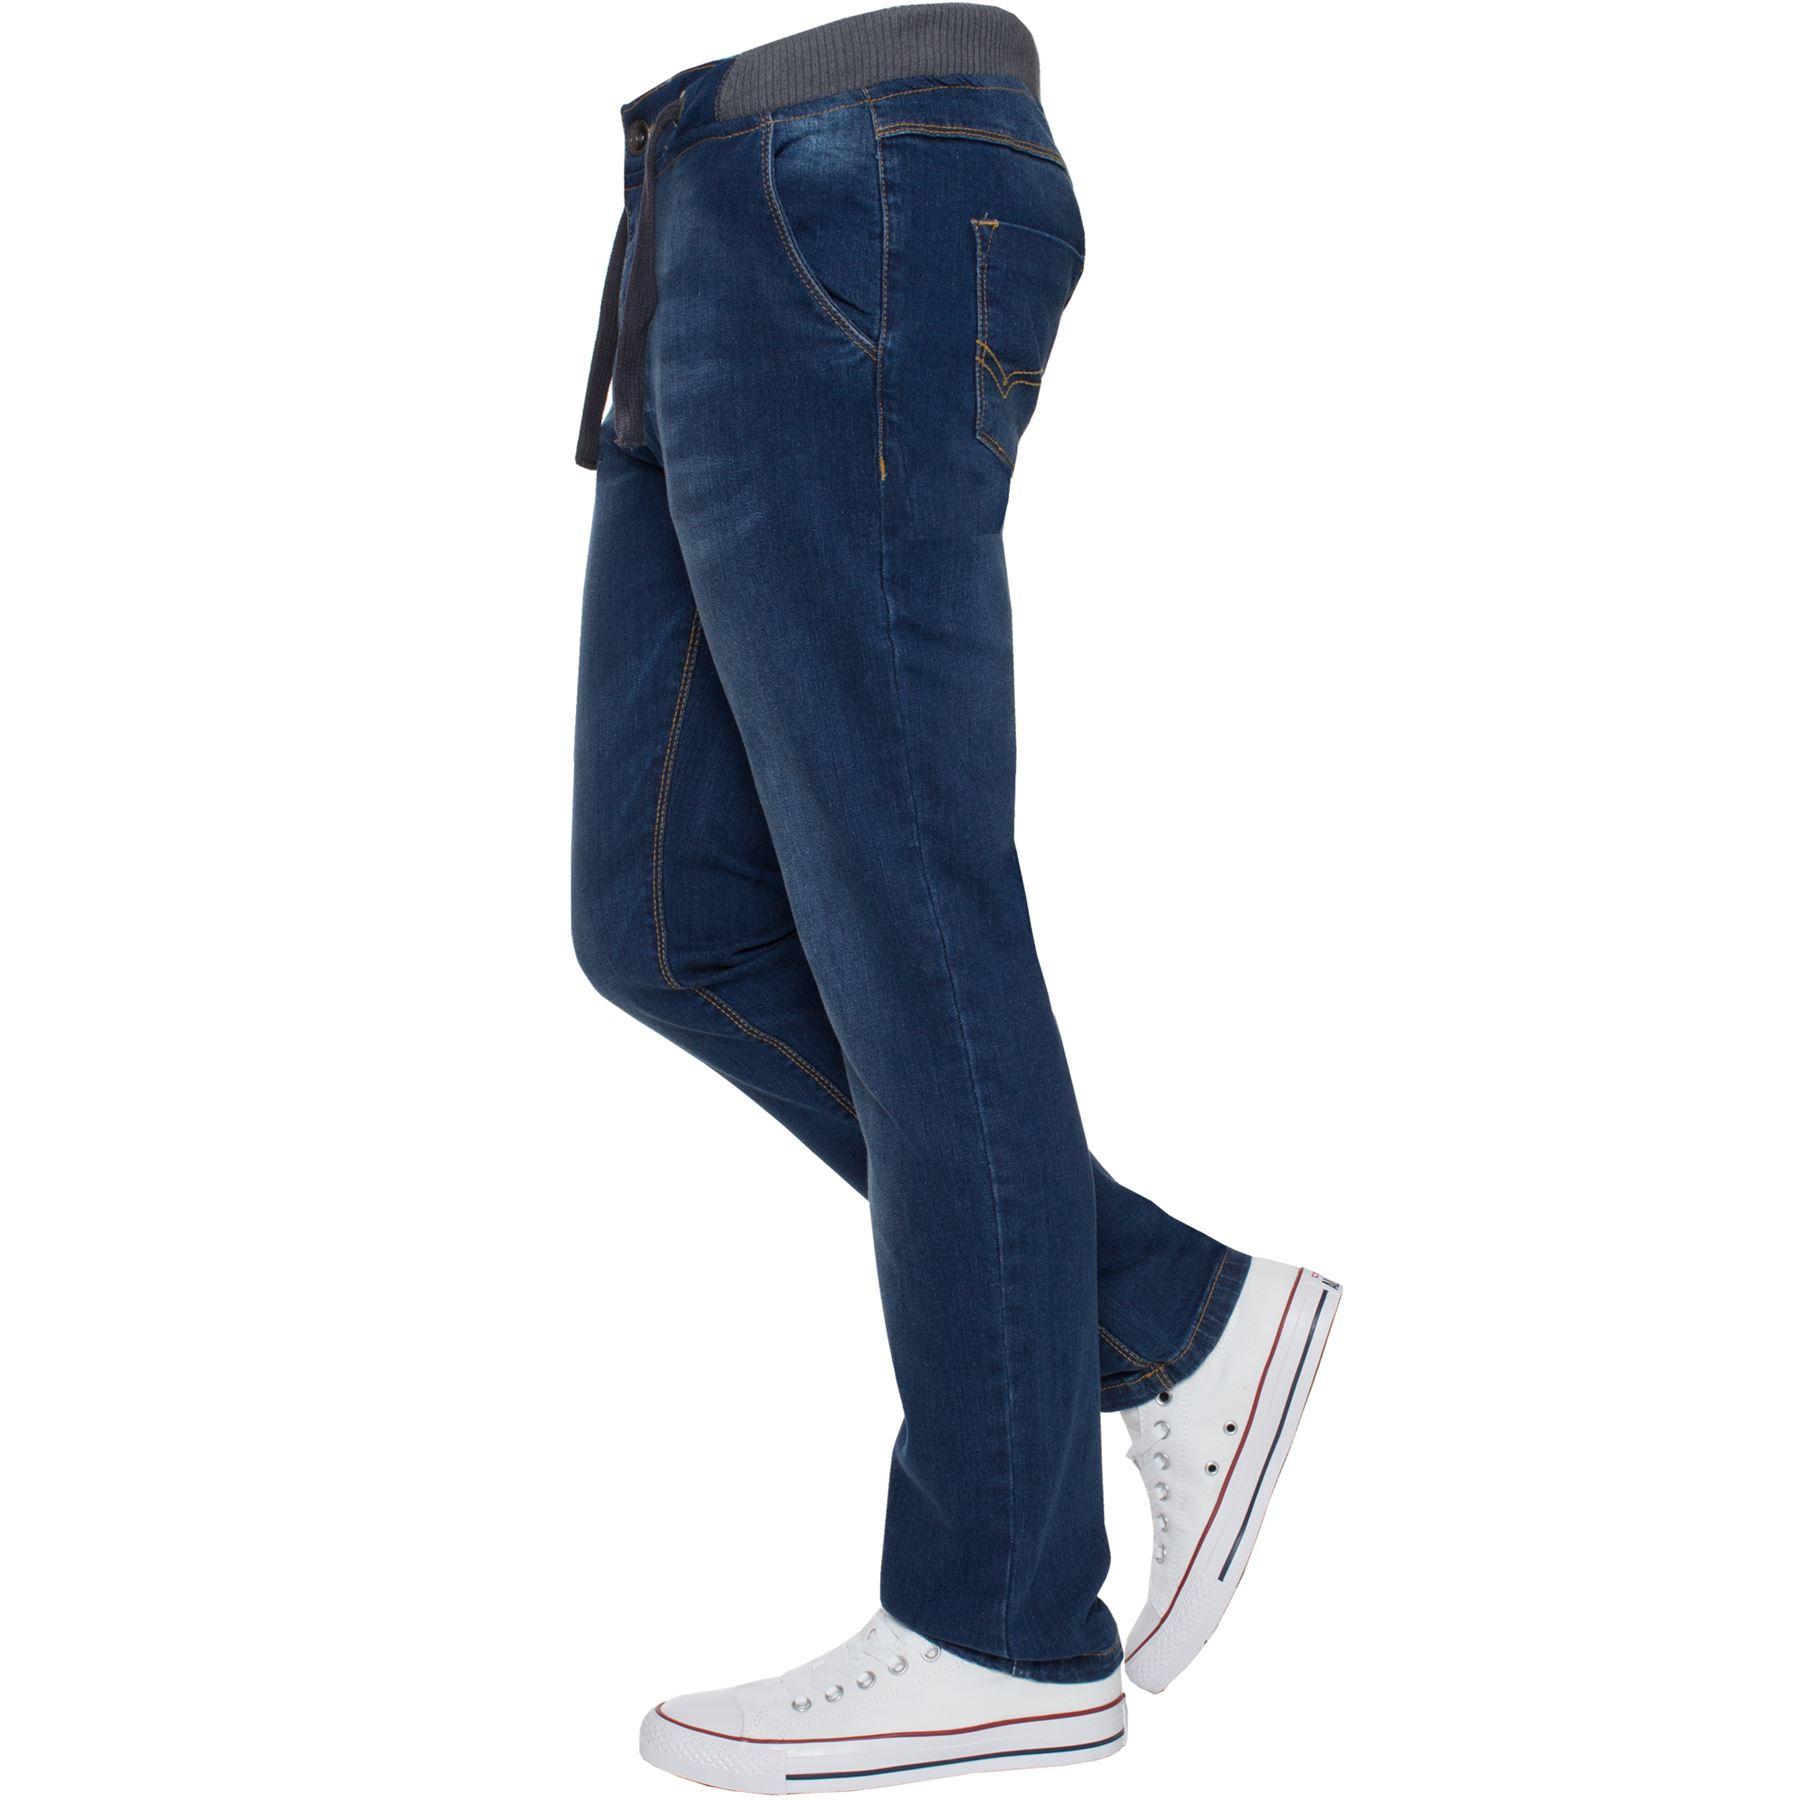 Jean-Garcon-Taille-Elastique-Enfants-Skinny-Stretch-School-Denim-Pantalon-Pantalon miniature 9